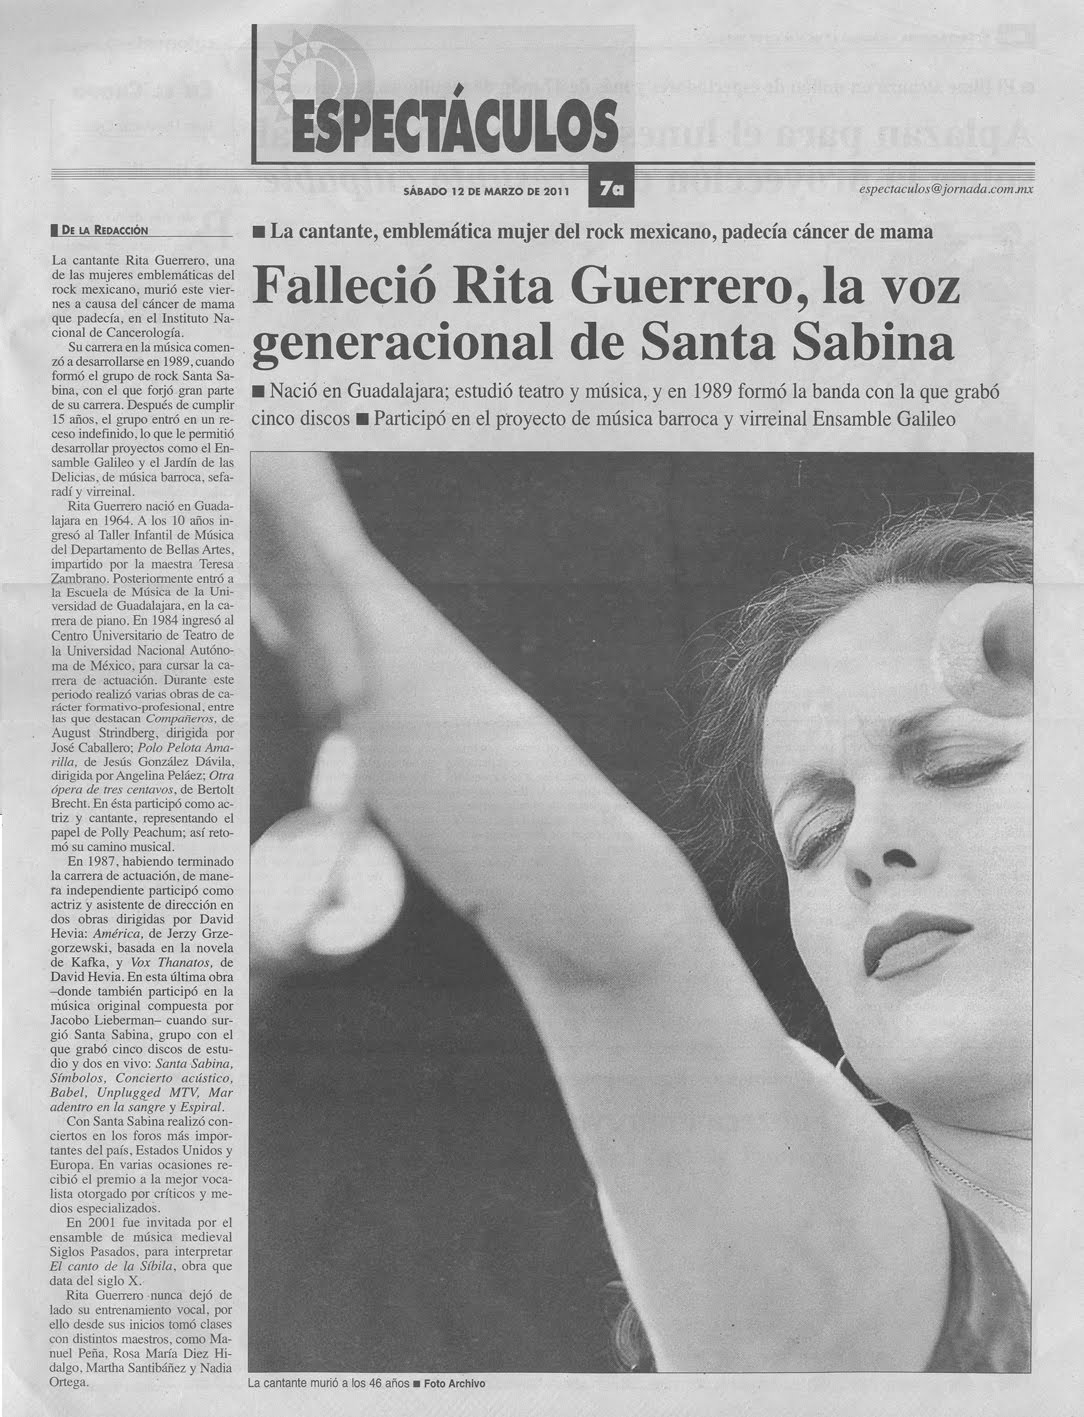 Ojalá fuera tu voz: Rita Guerrero, la voz generacional de Santa ...: http://ojalafueratuvoz.blogspot.com/2012/07/rita-guerrero-la-voz-generacional-de.html